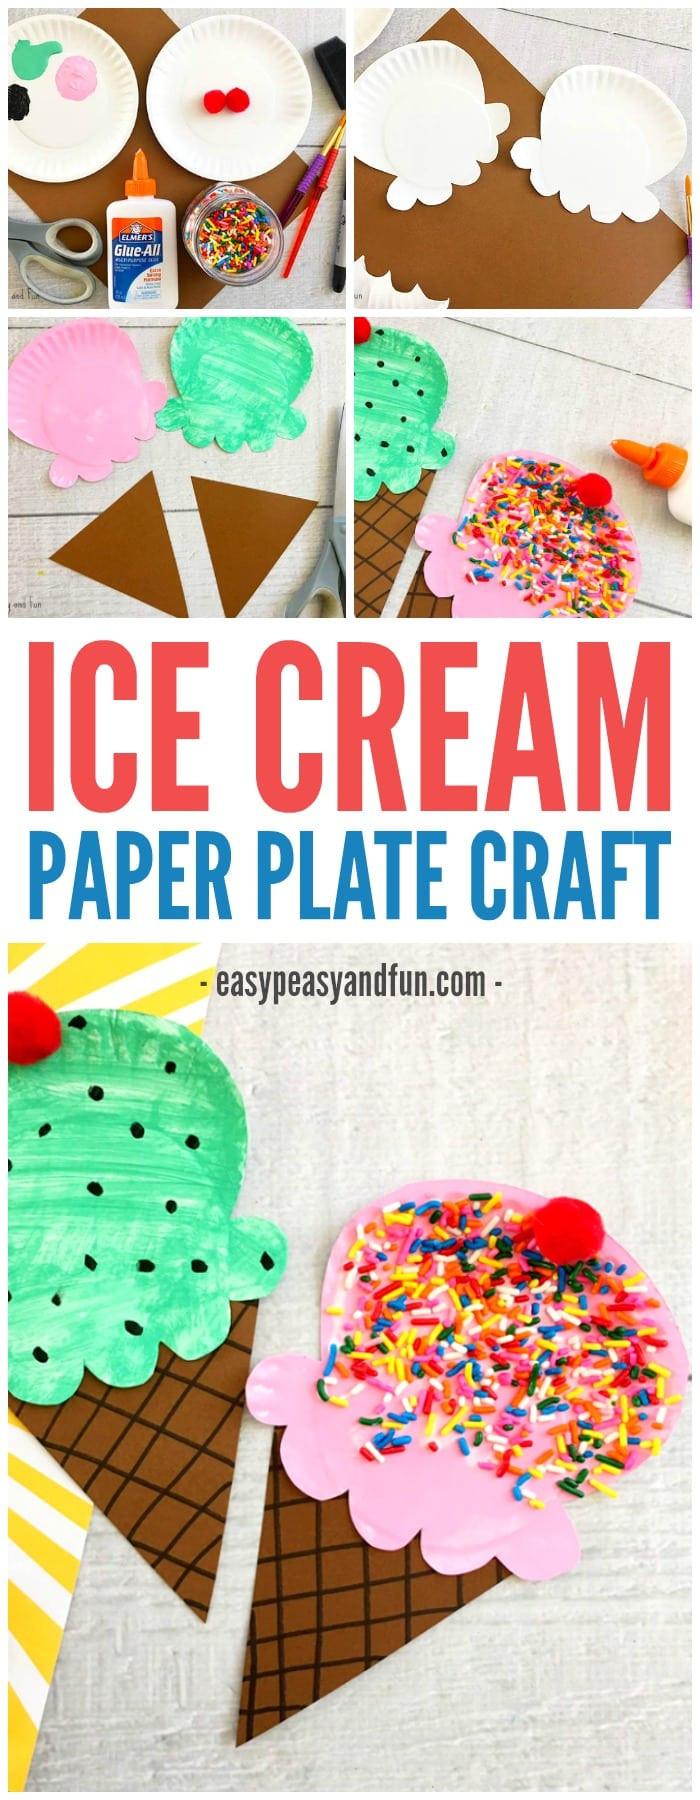 Preschool Summer Crafts Ideas  Paper Plate Ice Cream Craft Summer Craft Idea for Kids